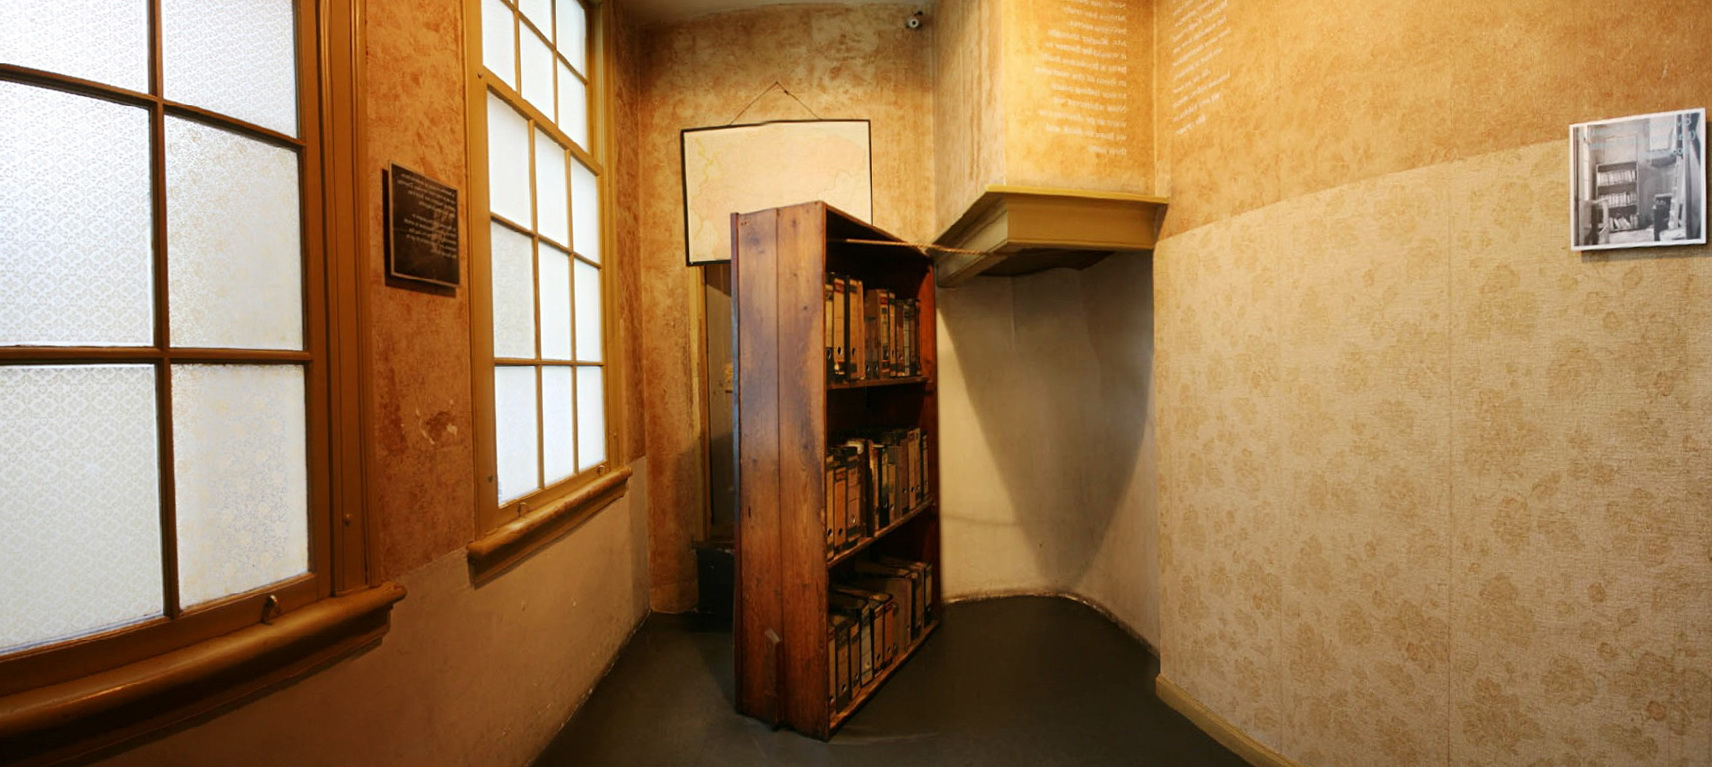 Charmant Anne Frank Secret Bookcase Door